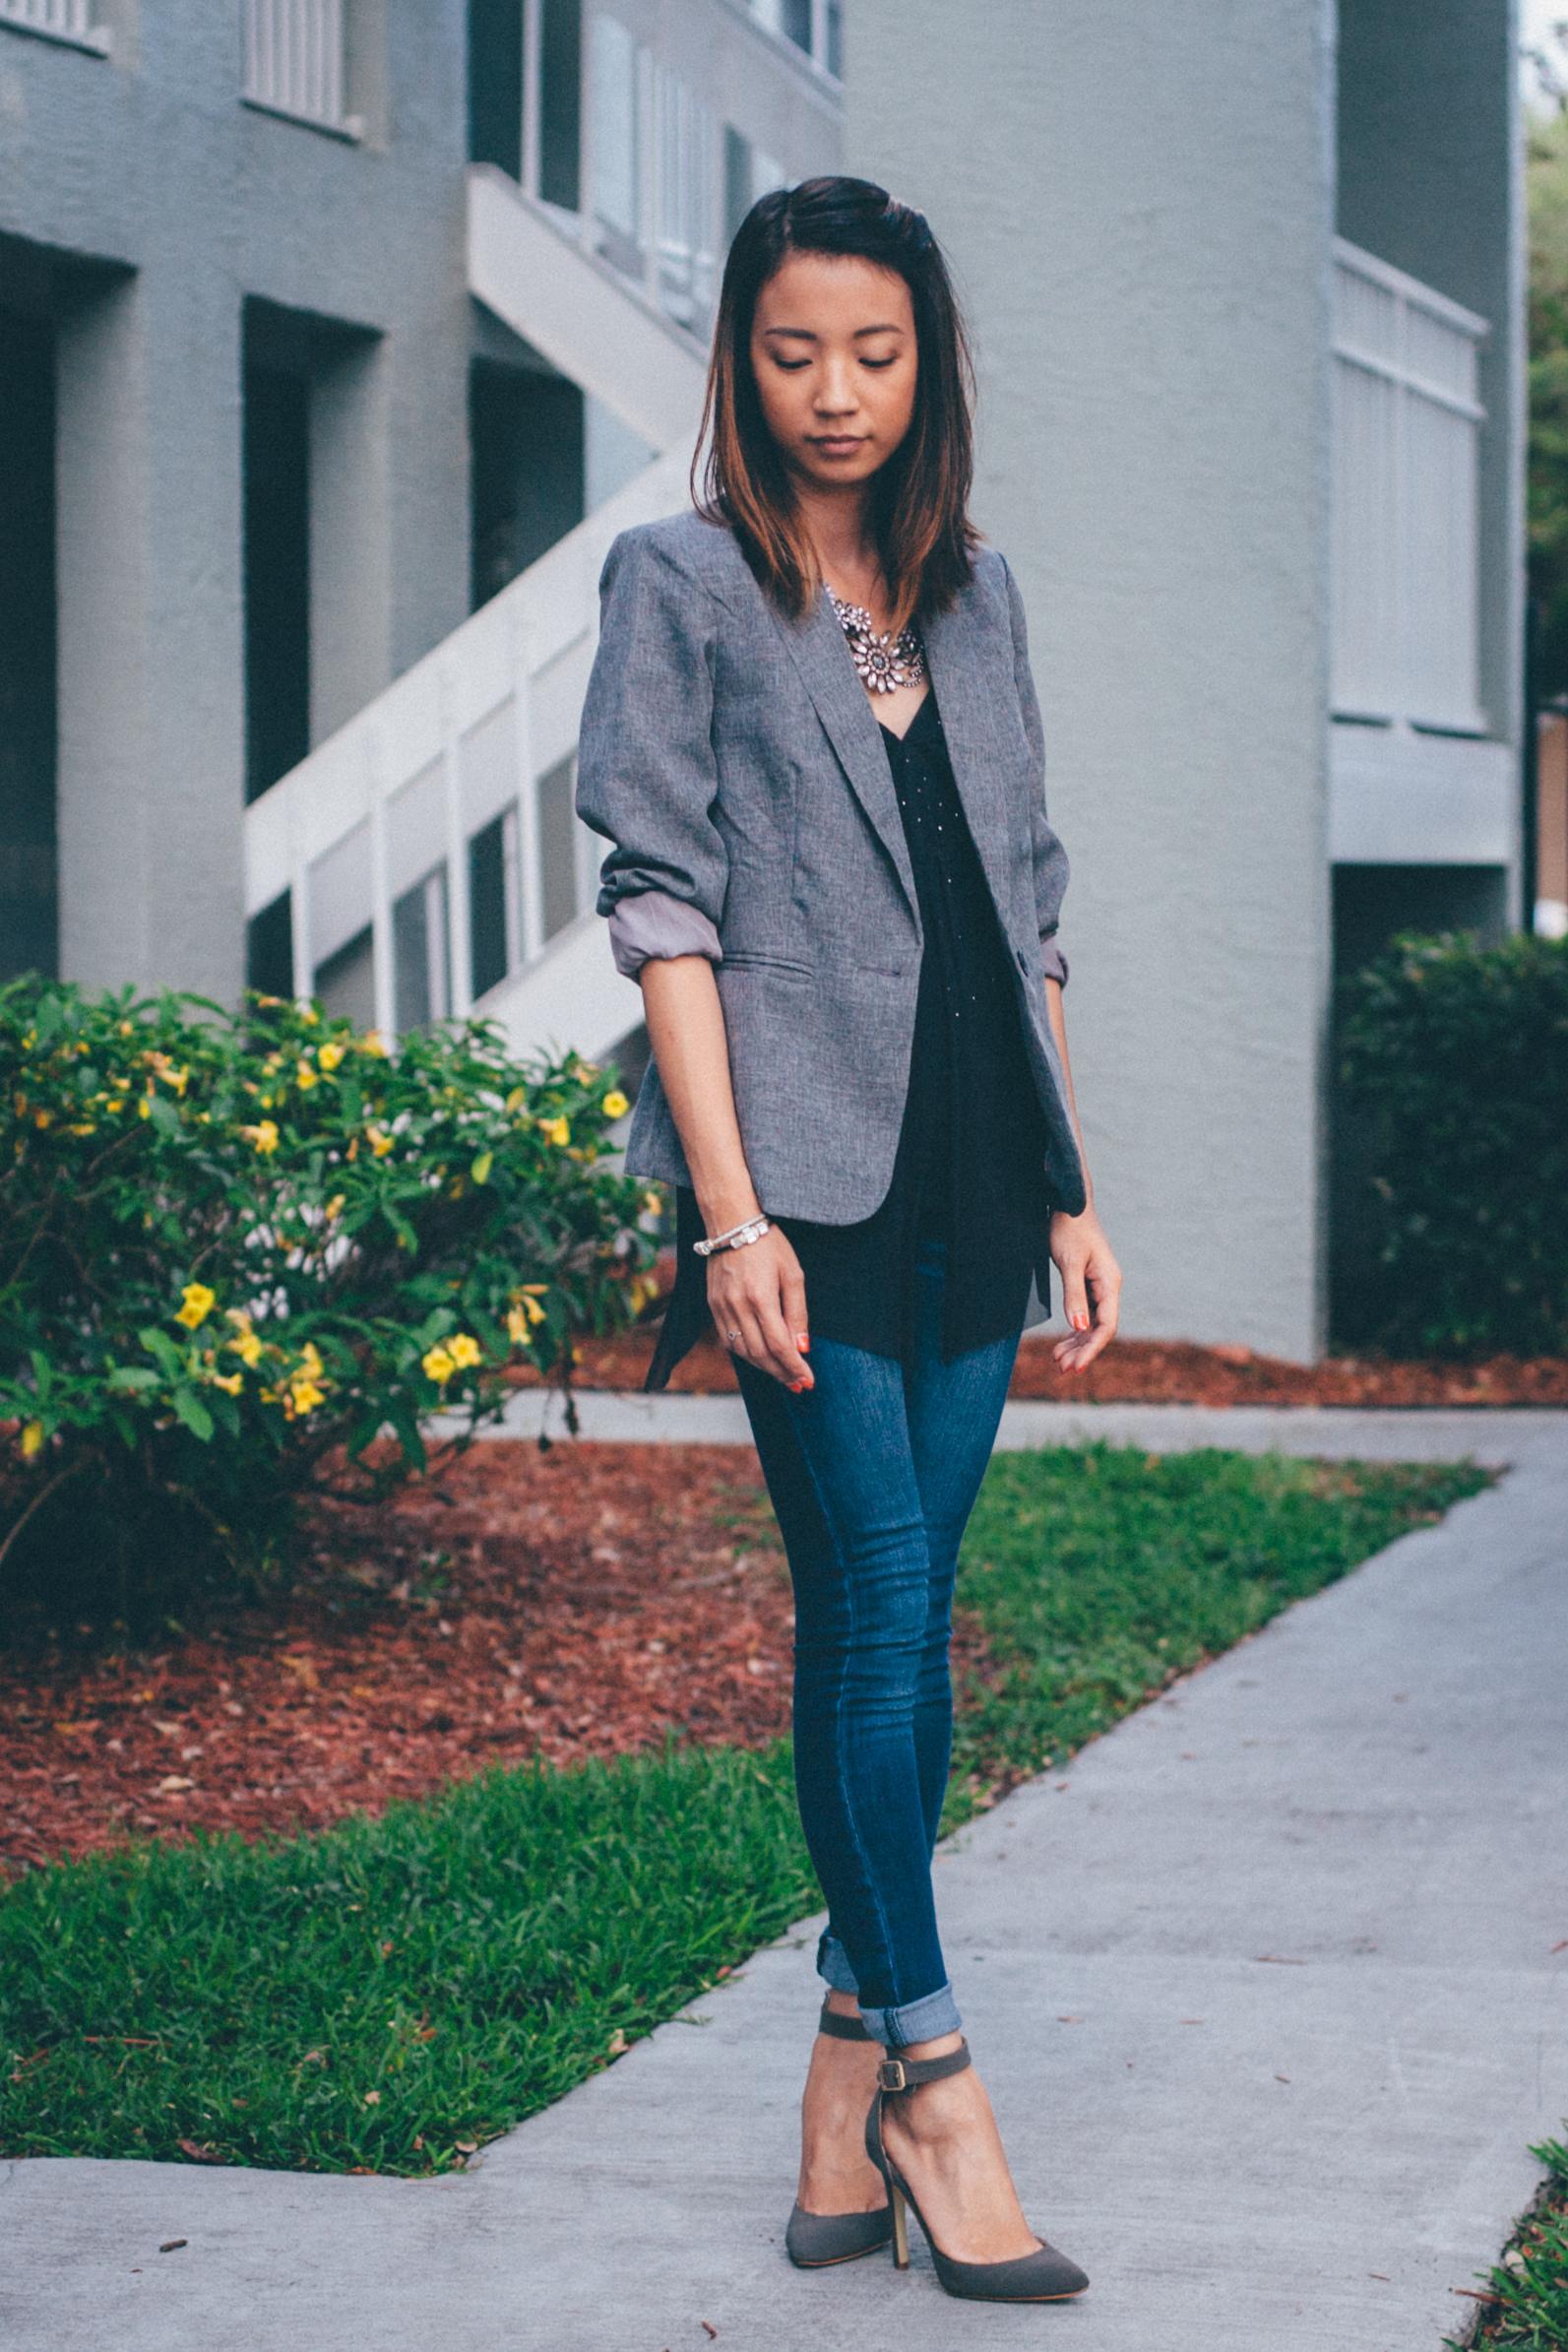 This Jenn Girl - Shein Gray Blazer 5